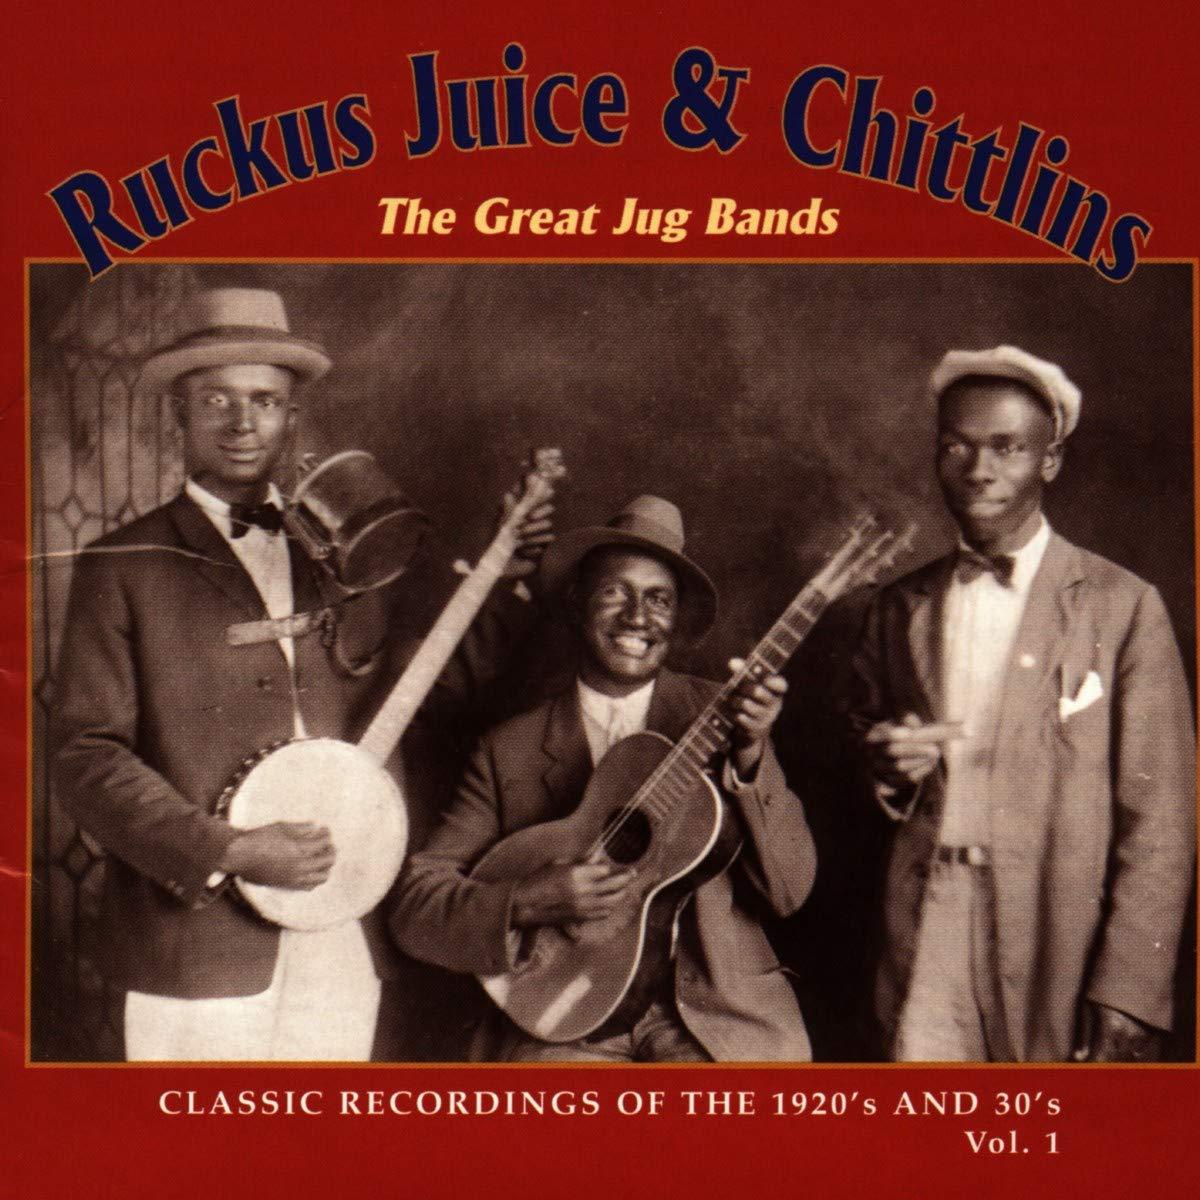 Ruckus Juice Chitlins Max 50% OFF 1 [Alternative dealer] Various